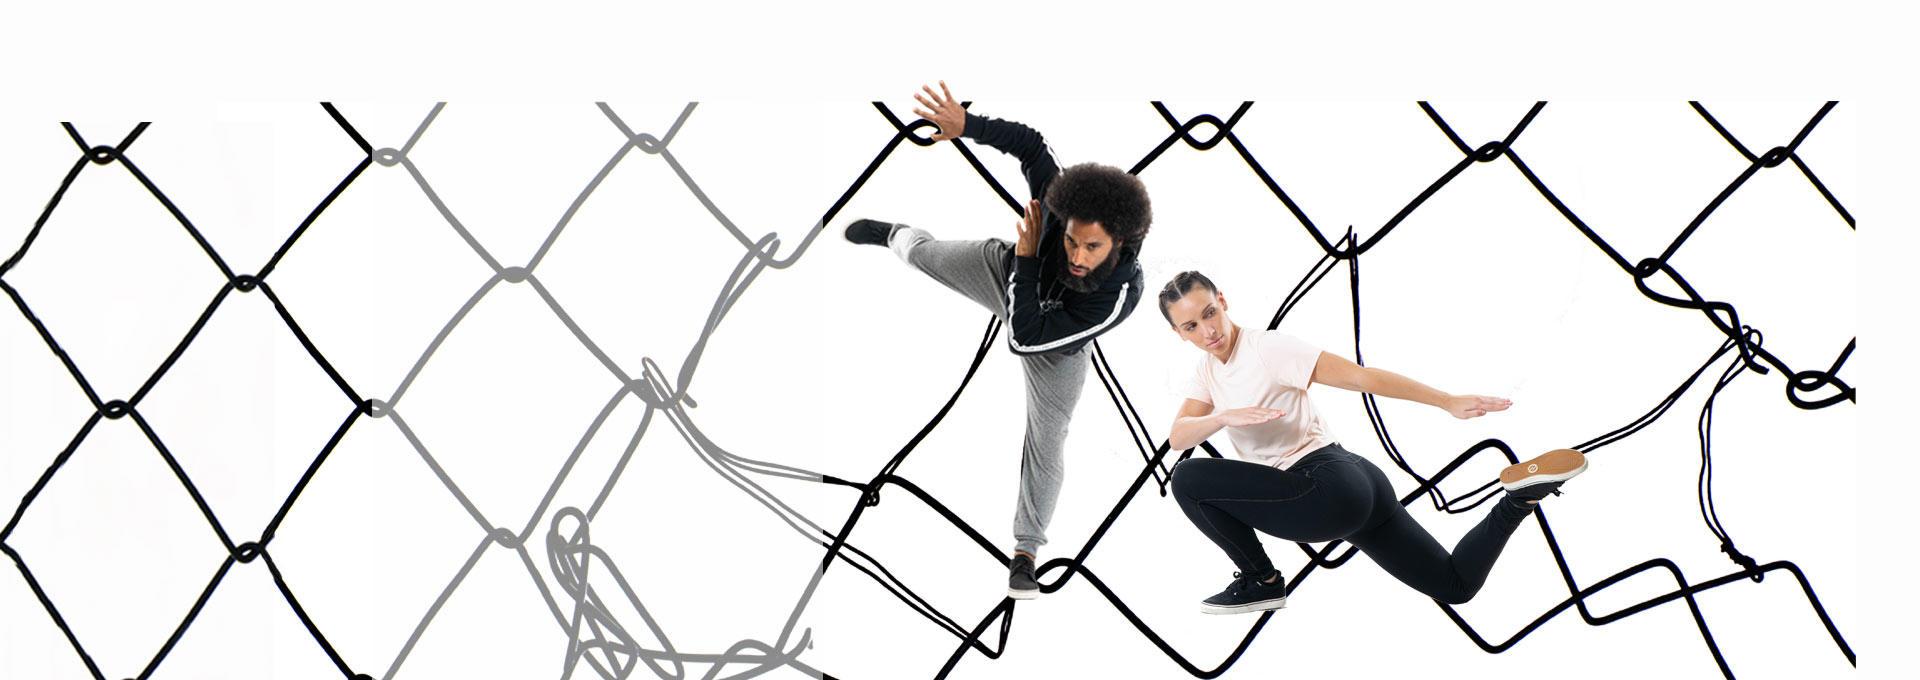 HIPHOP, locking, popping, breakdance, danse urbaine decathlon